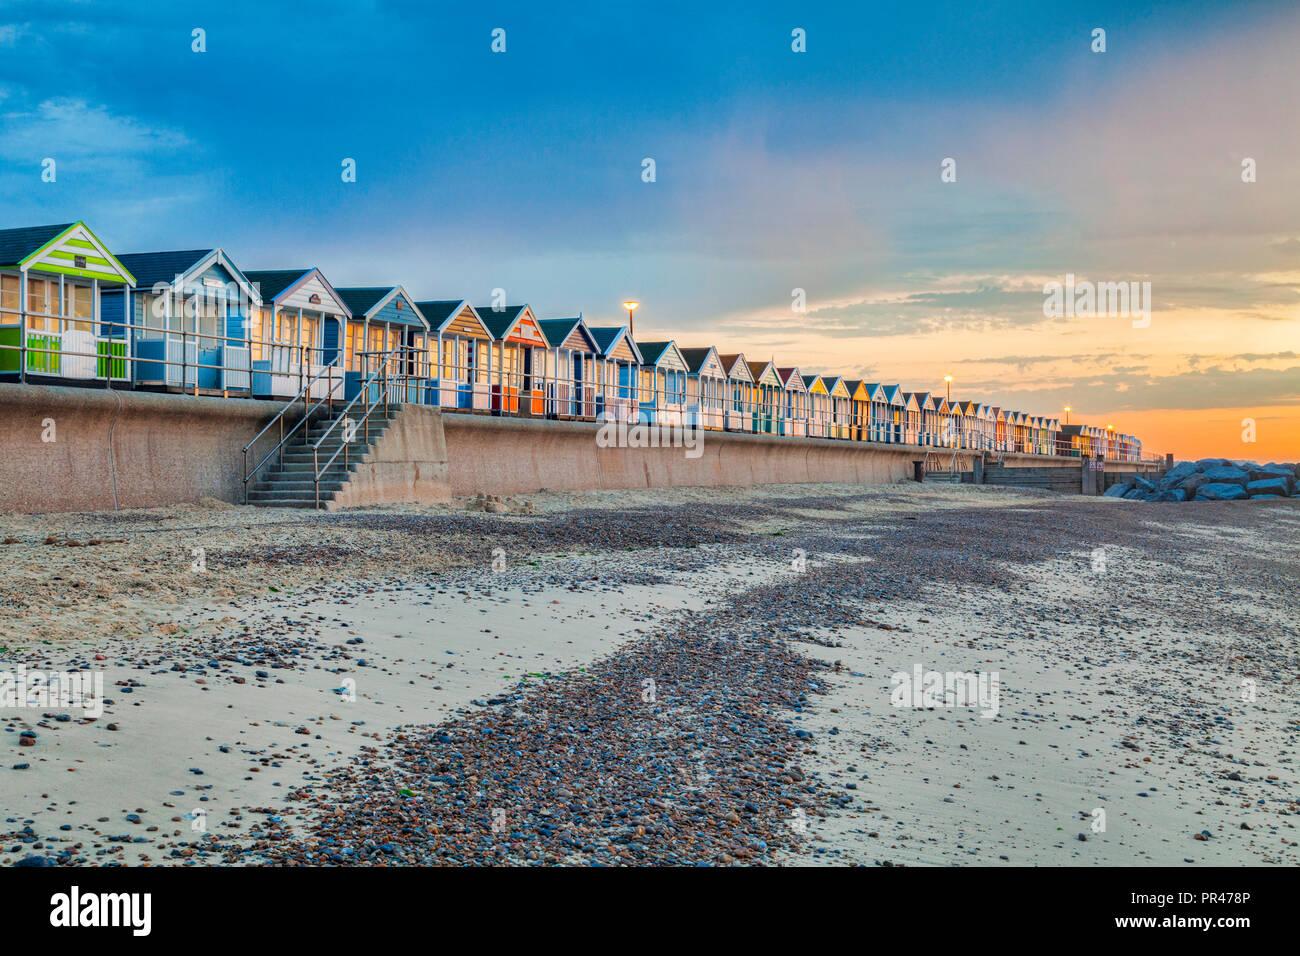 Beach huts at Southwold, Suffolk, England, at sunrise. Stock Photo